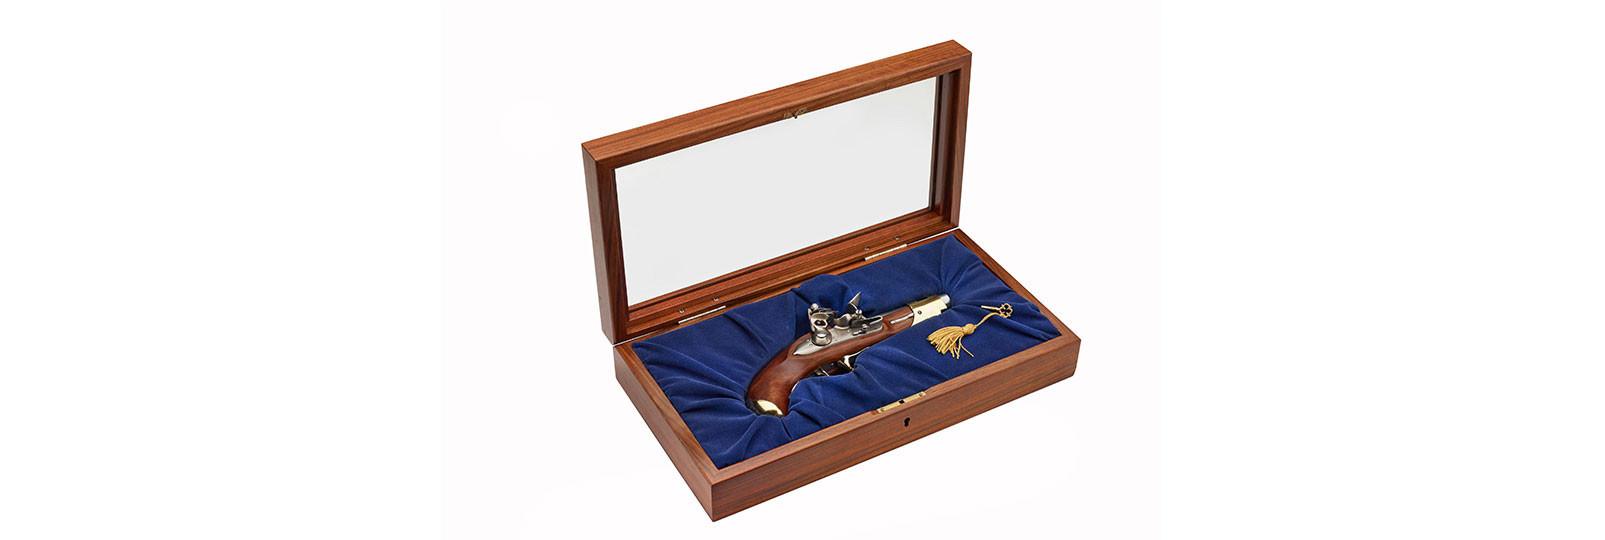 Mod.1814 Pistol Reale dei Carabinieri with case